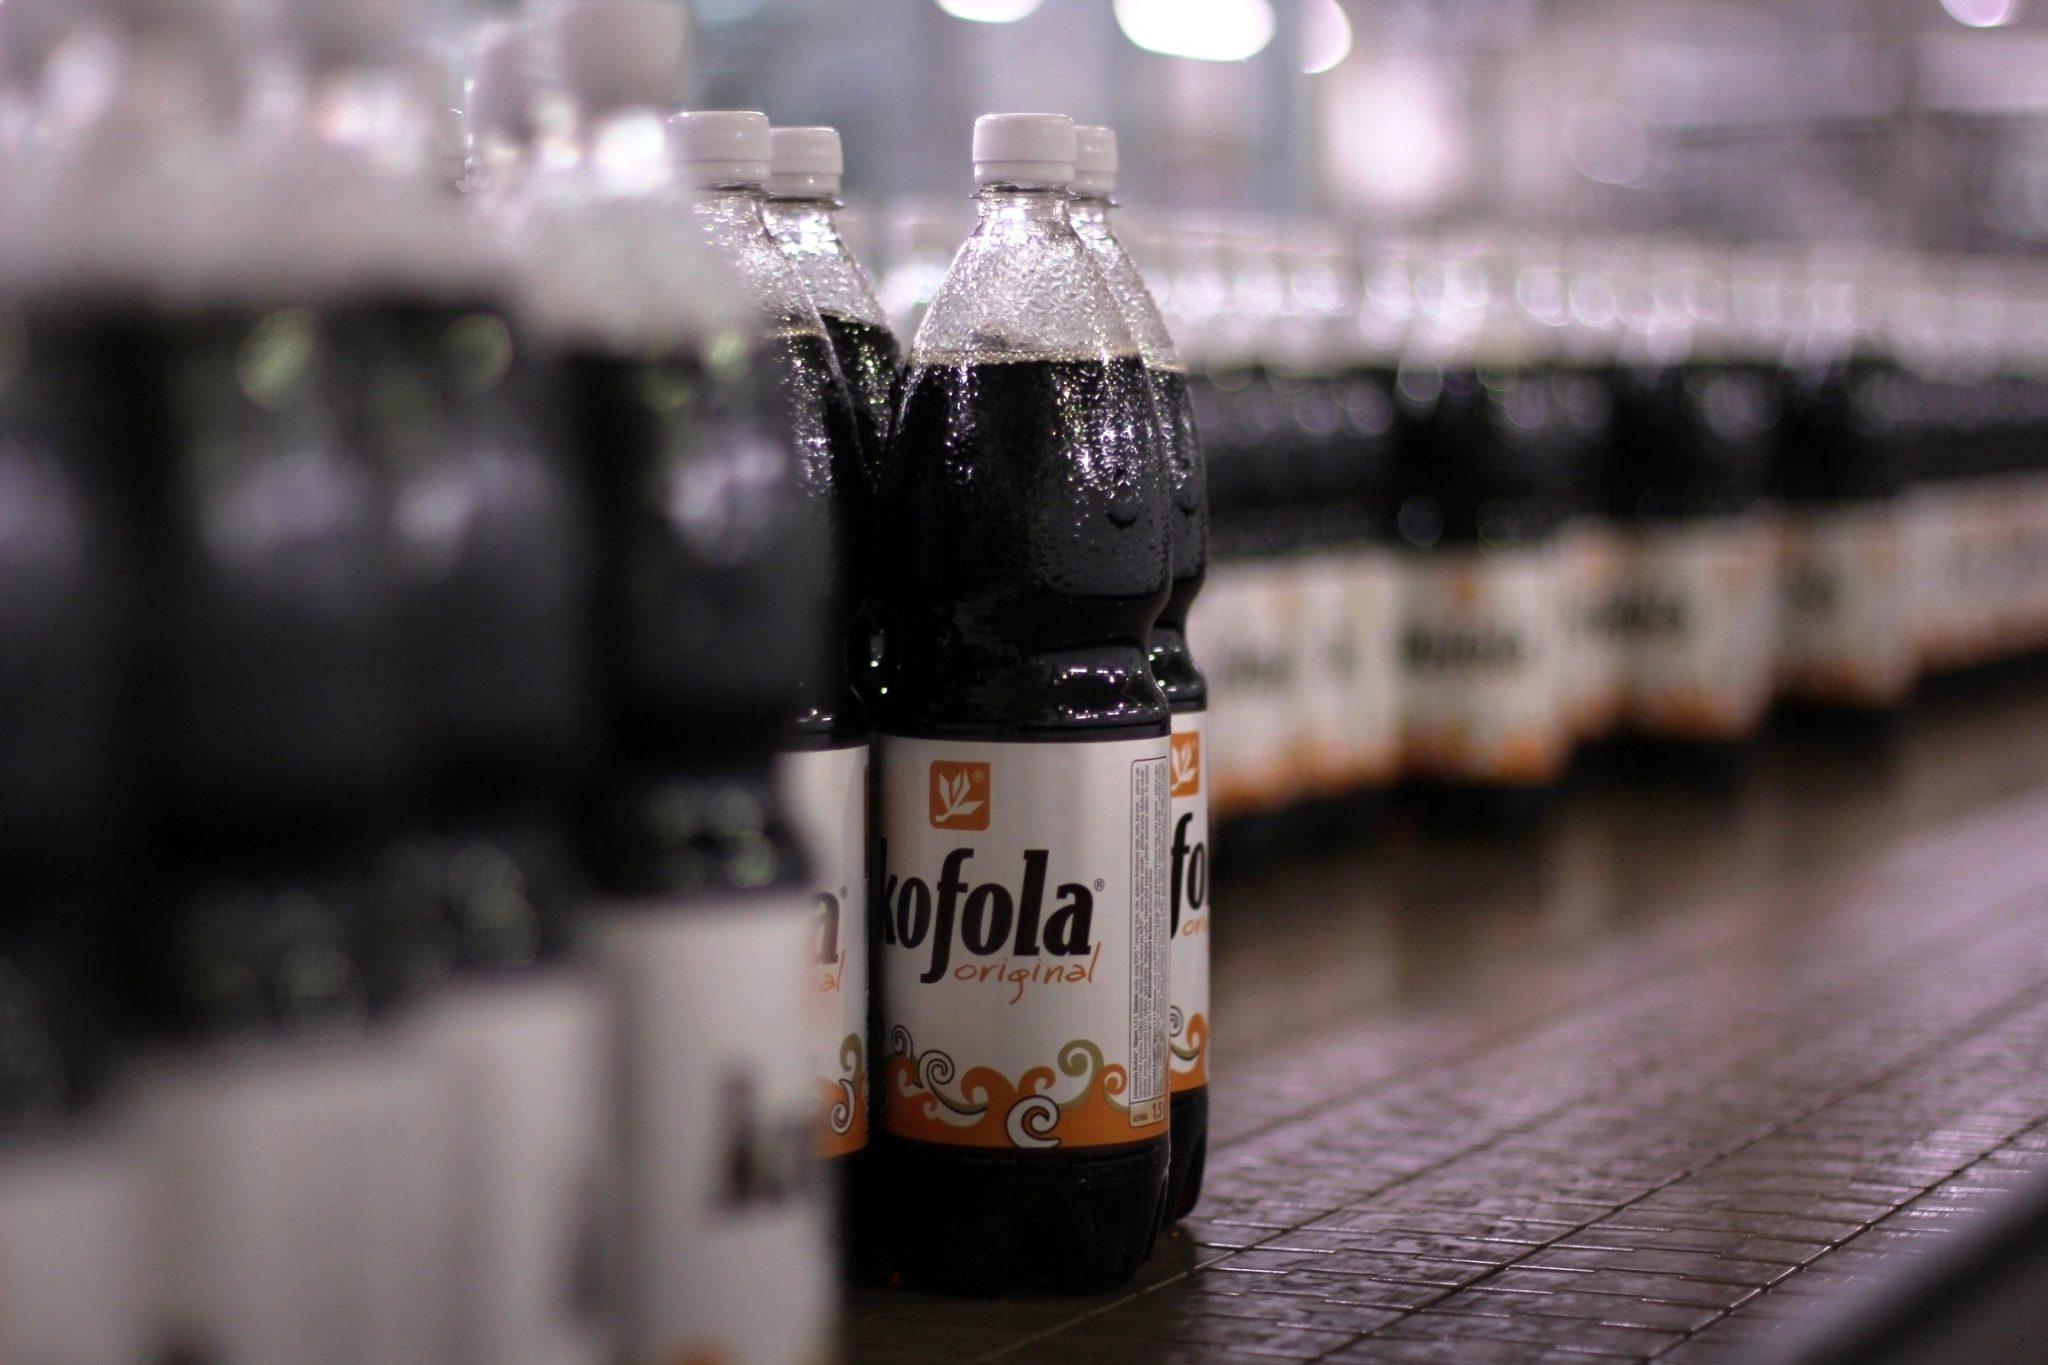 kofola-original